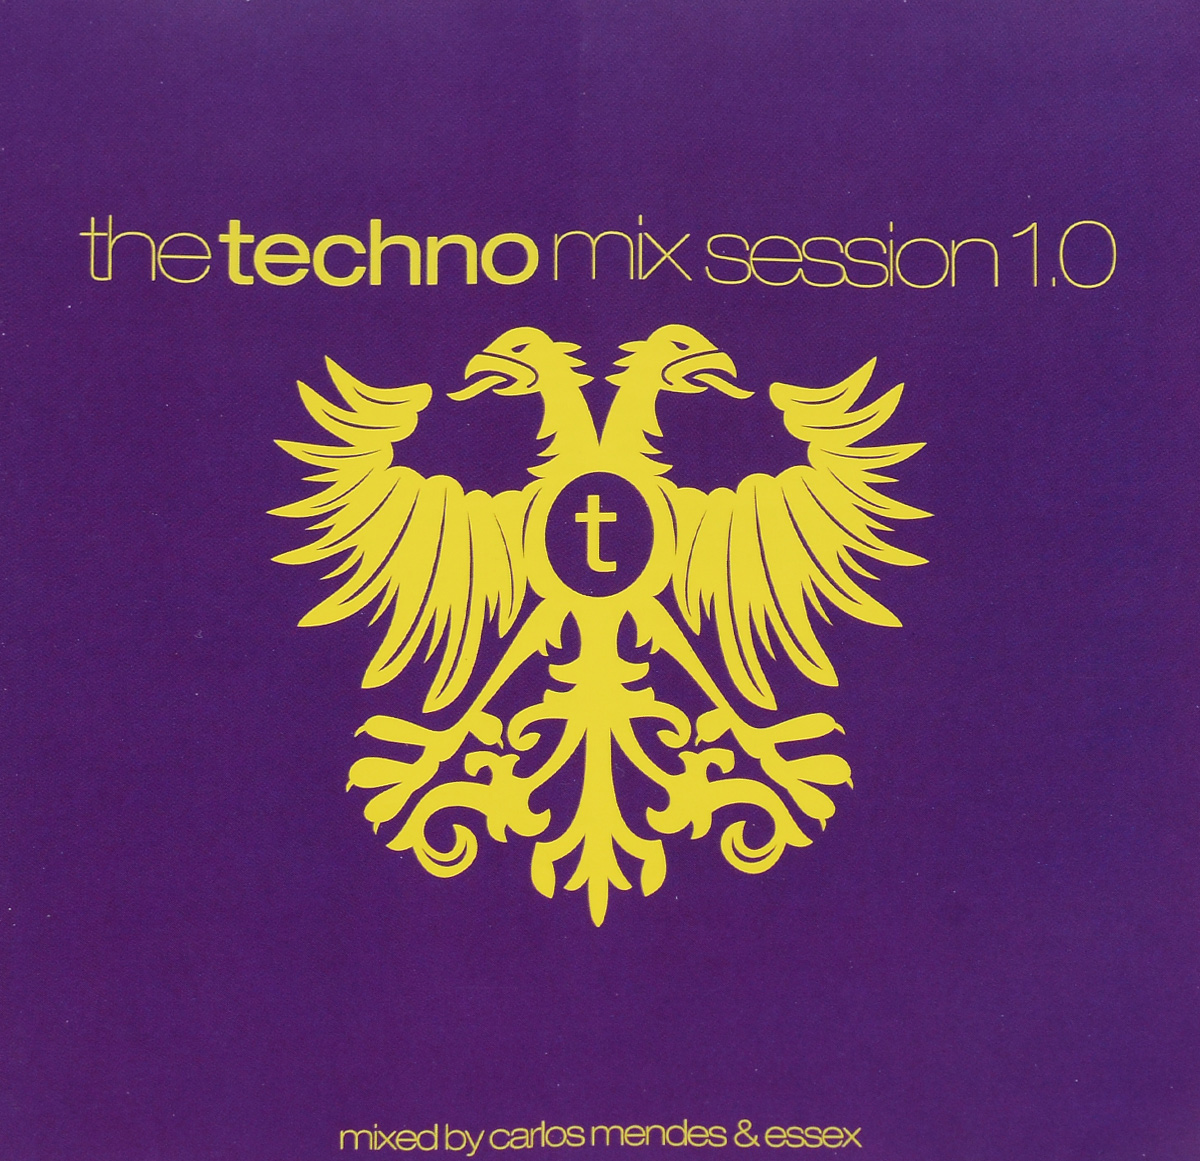 Мендес Луис Карлос,Essex,Себастьян Гневков,Фил Фулднер,Мартин Доусон,Nudisco,Dj Sin Plomo The Techno Mix Session 1.0 (2 CD)